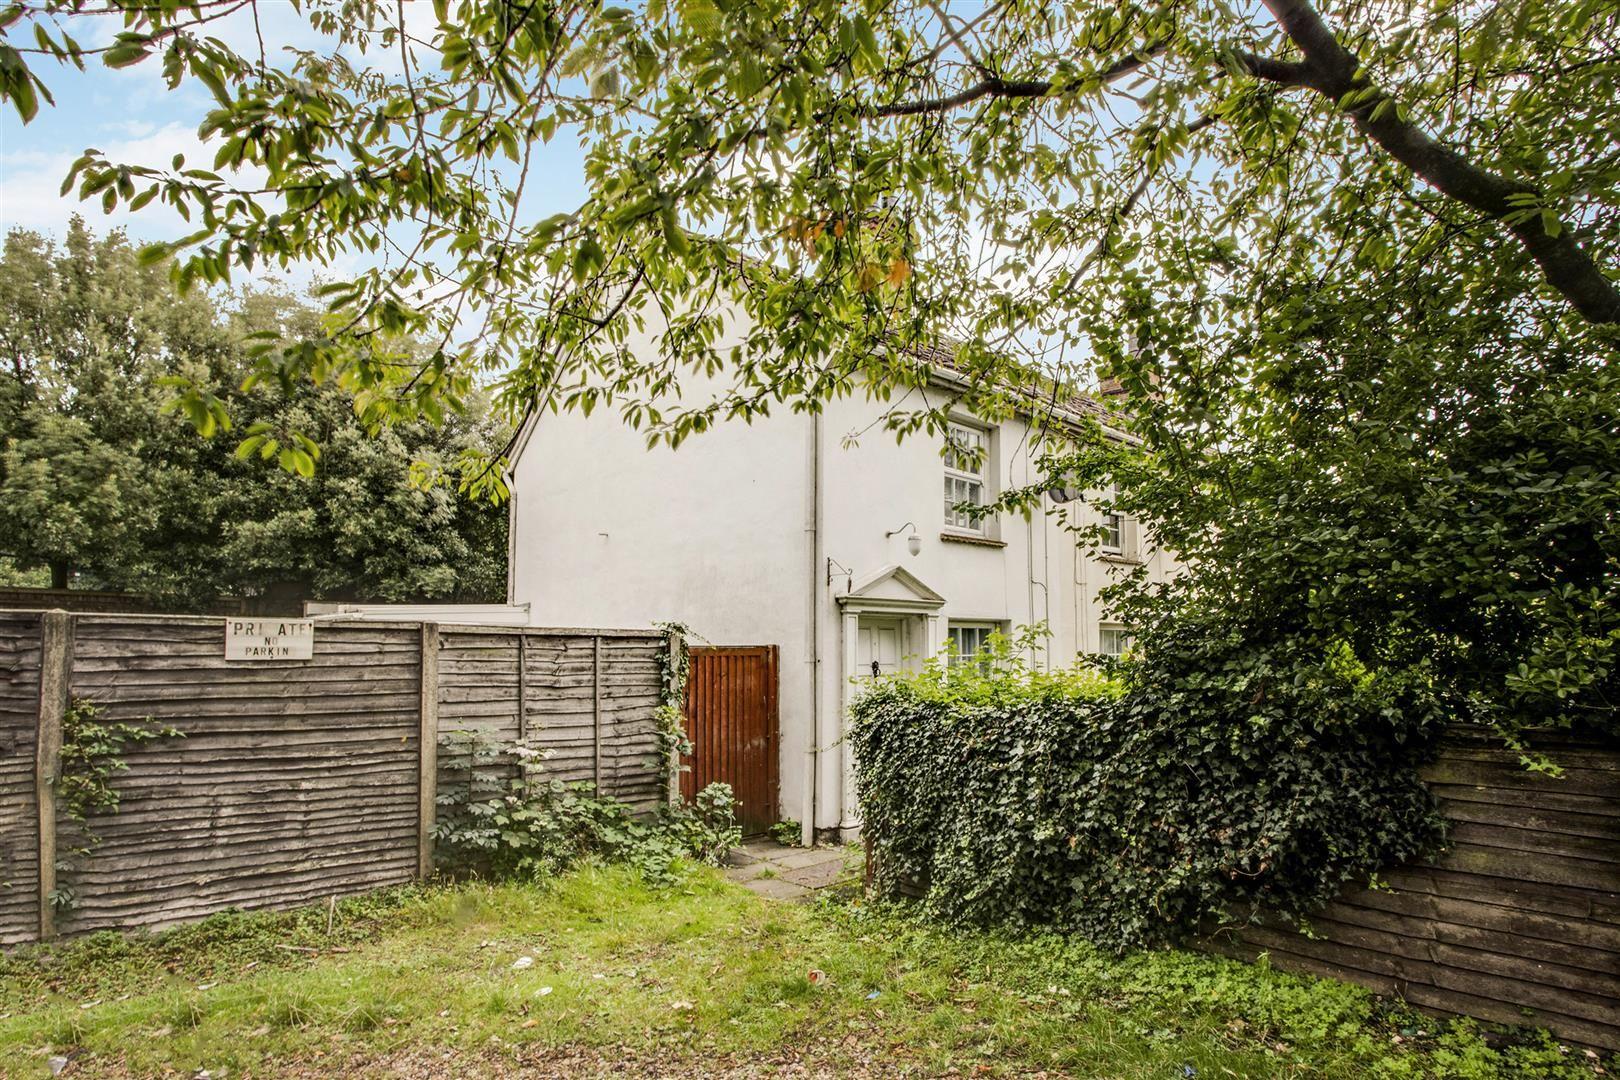 Property photo 1 of 15. Ph13_2396318.Jpg